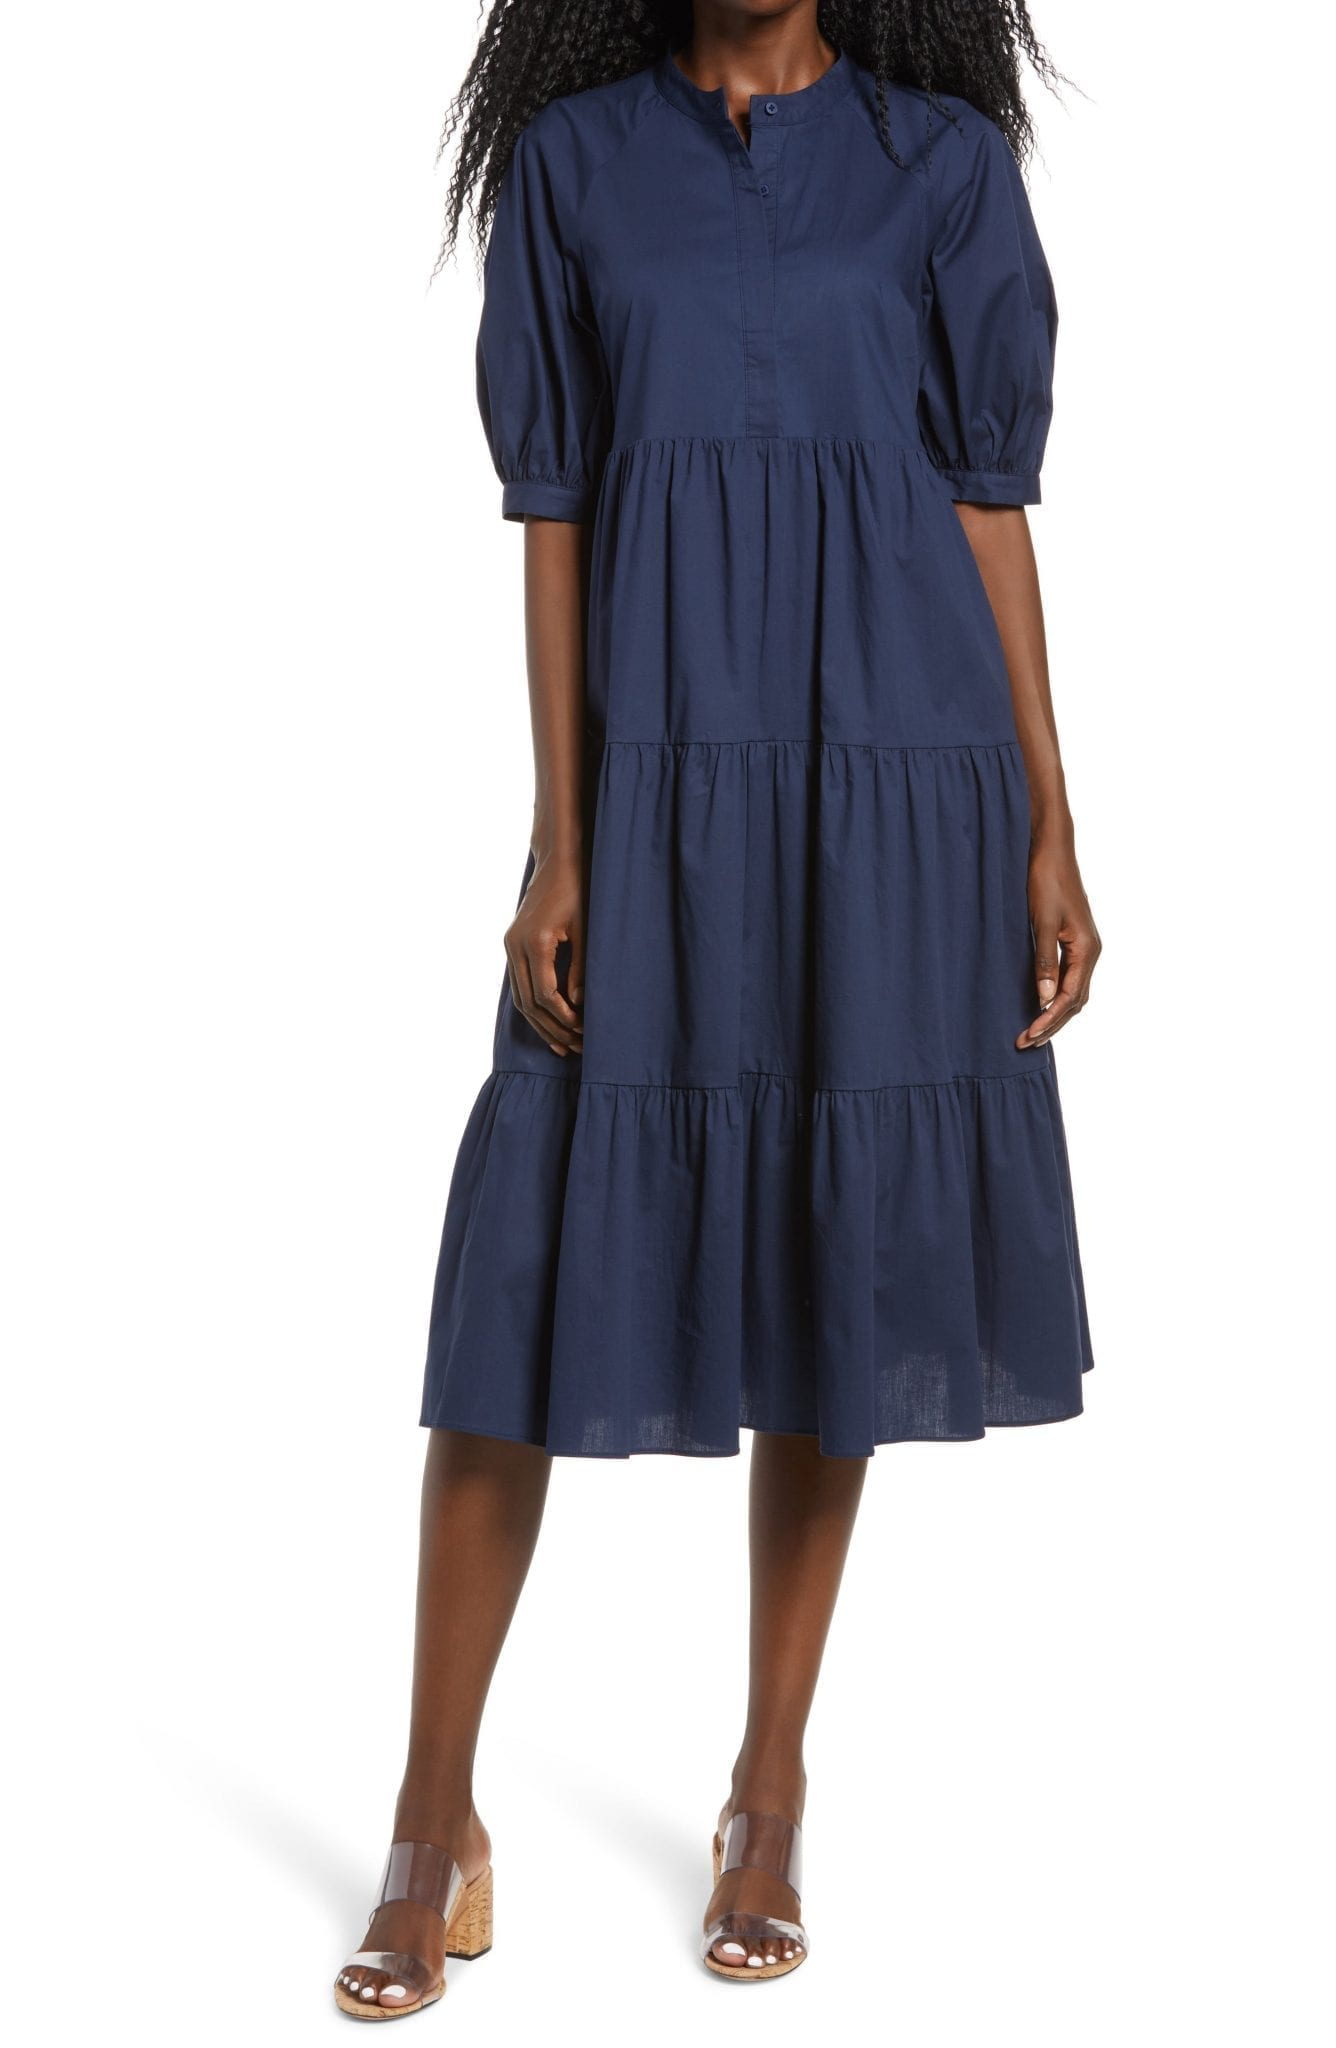 ENGLISH FACTORY Puff Sleeve Dress